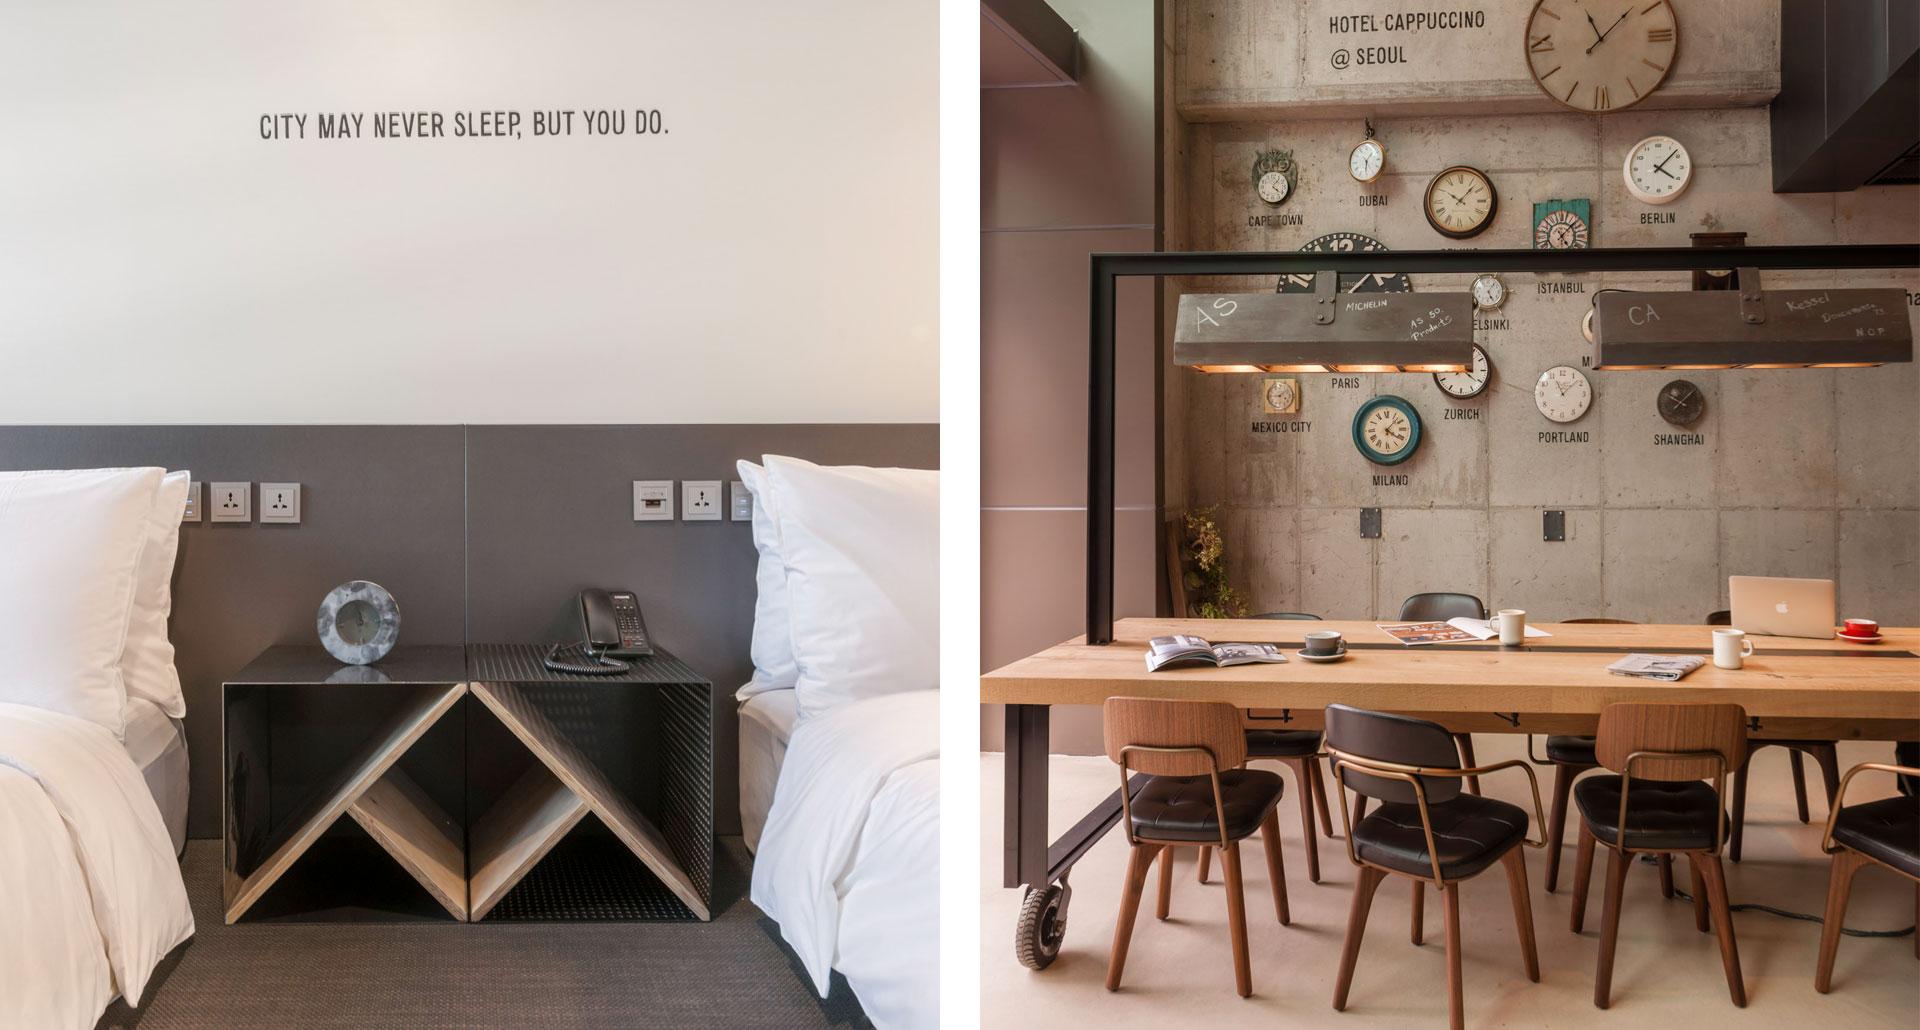 Hotel Cappuccino - boutique hotel in Seoul